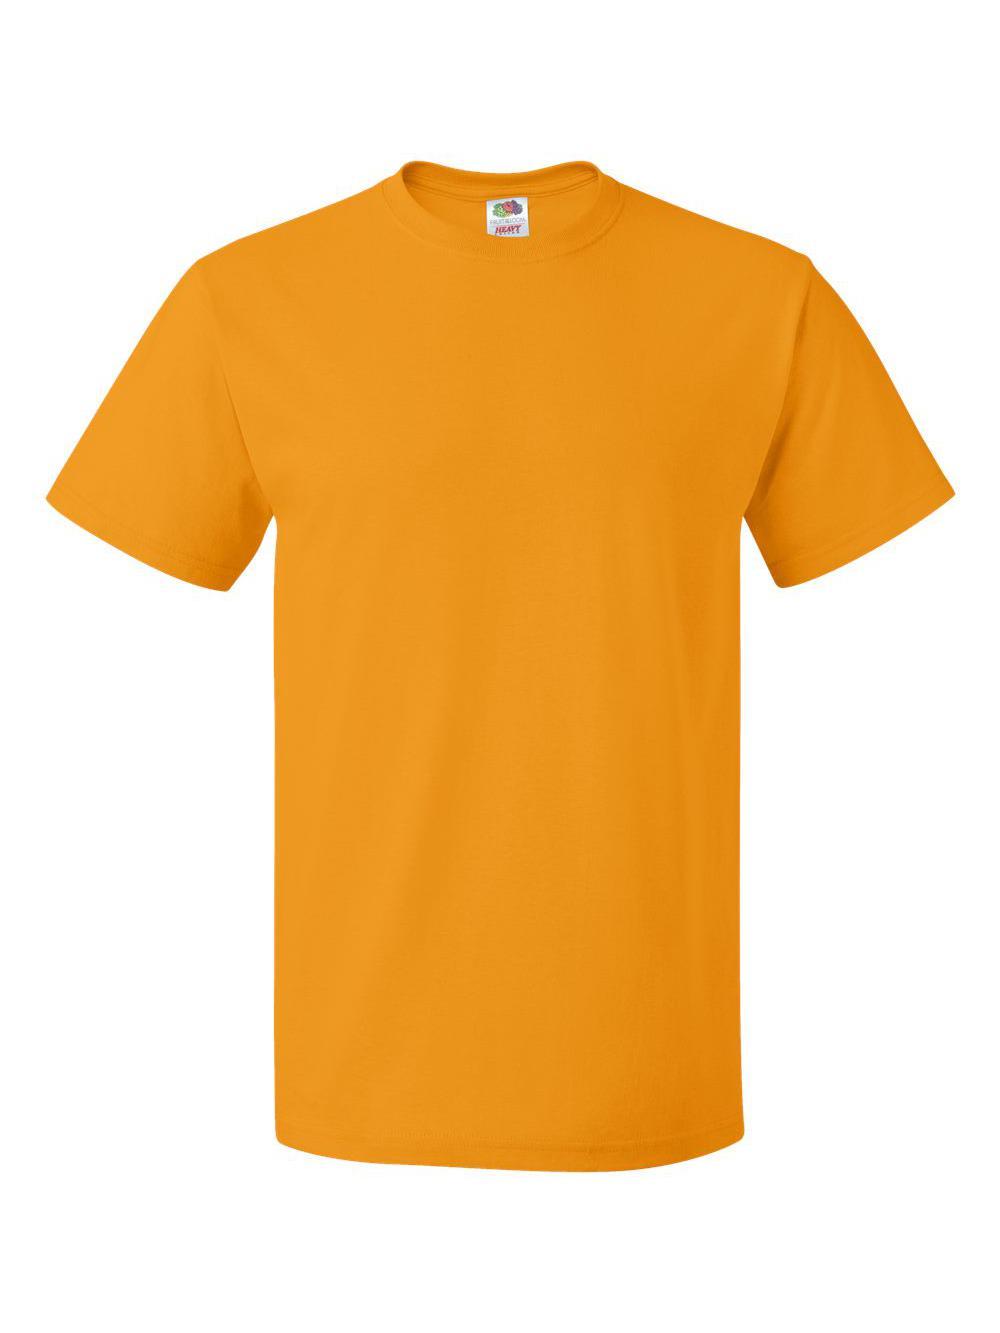 Fruit-of-the-Loom-HD-Cotton-Short-Sleeve-T-Shirt-3930R thumbnail 120